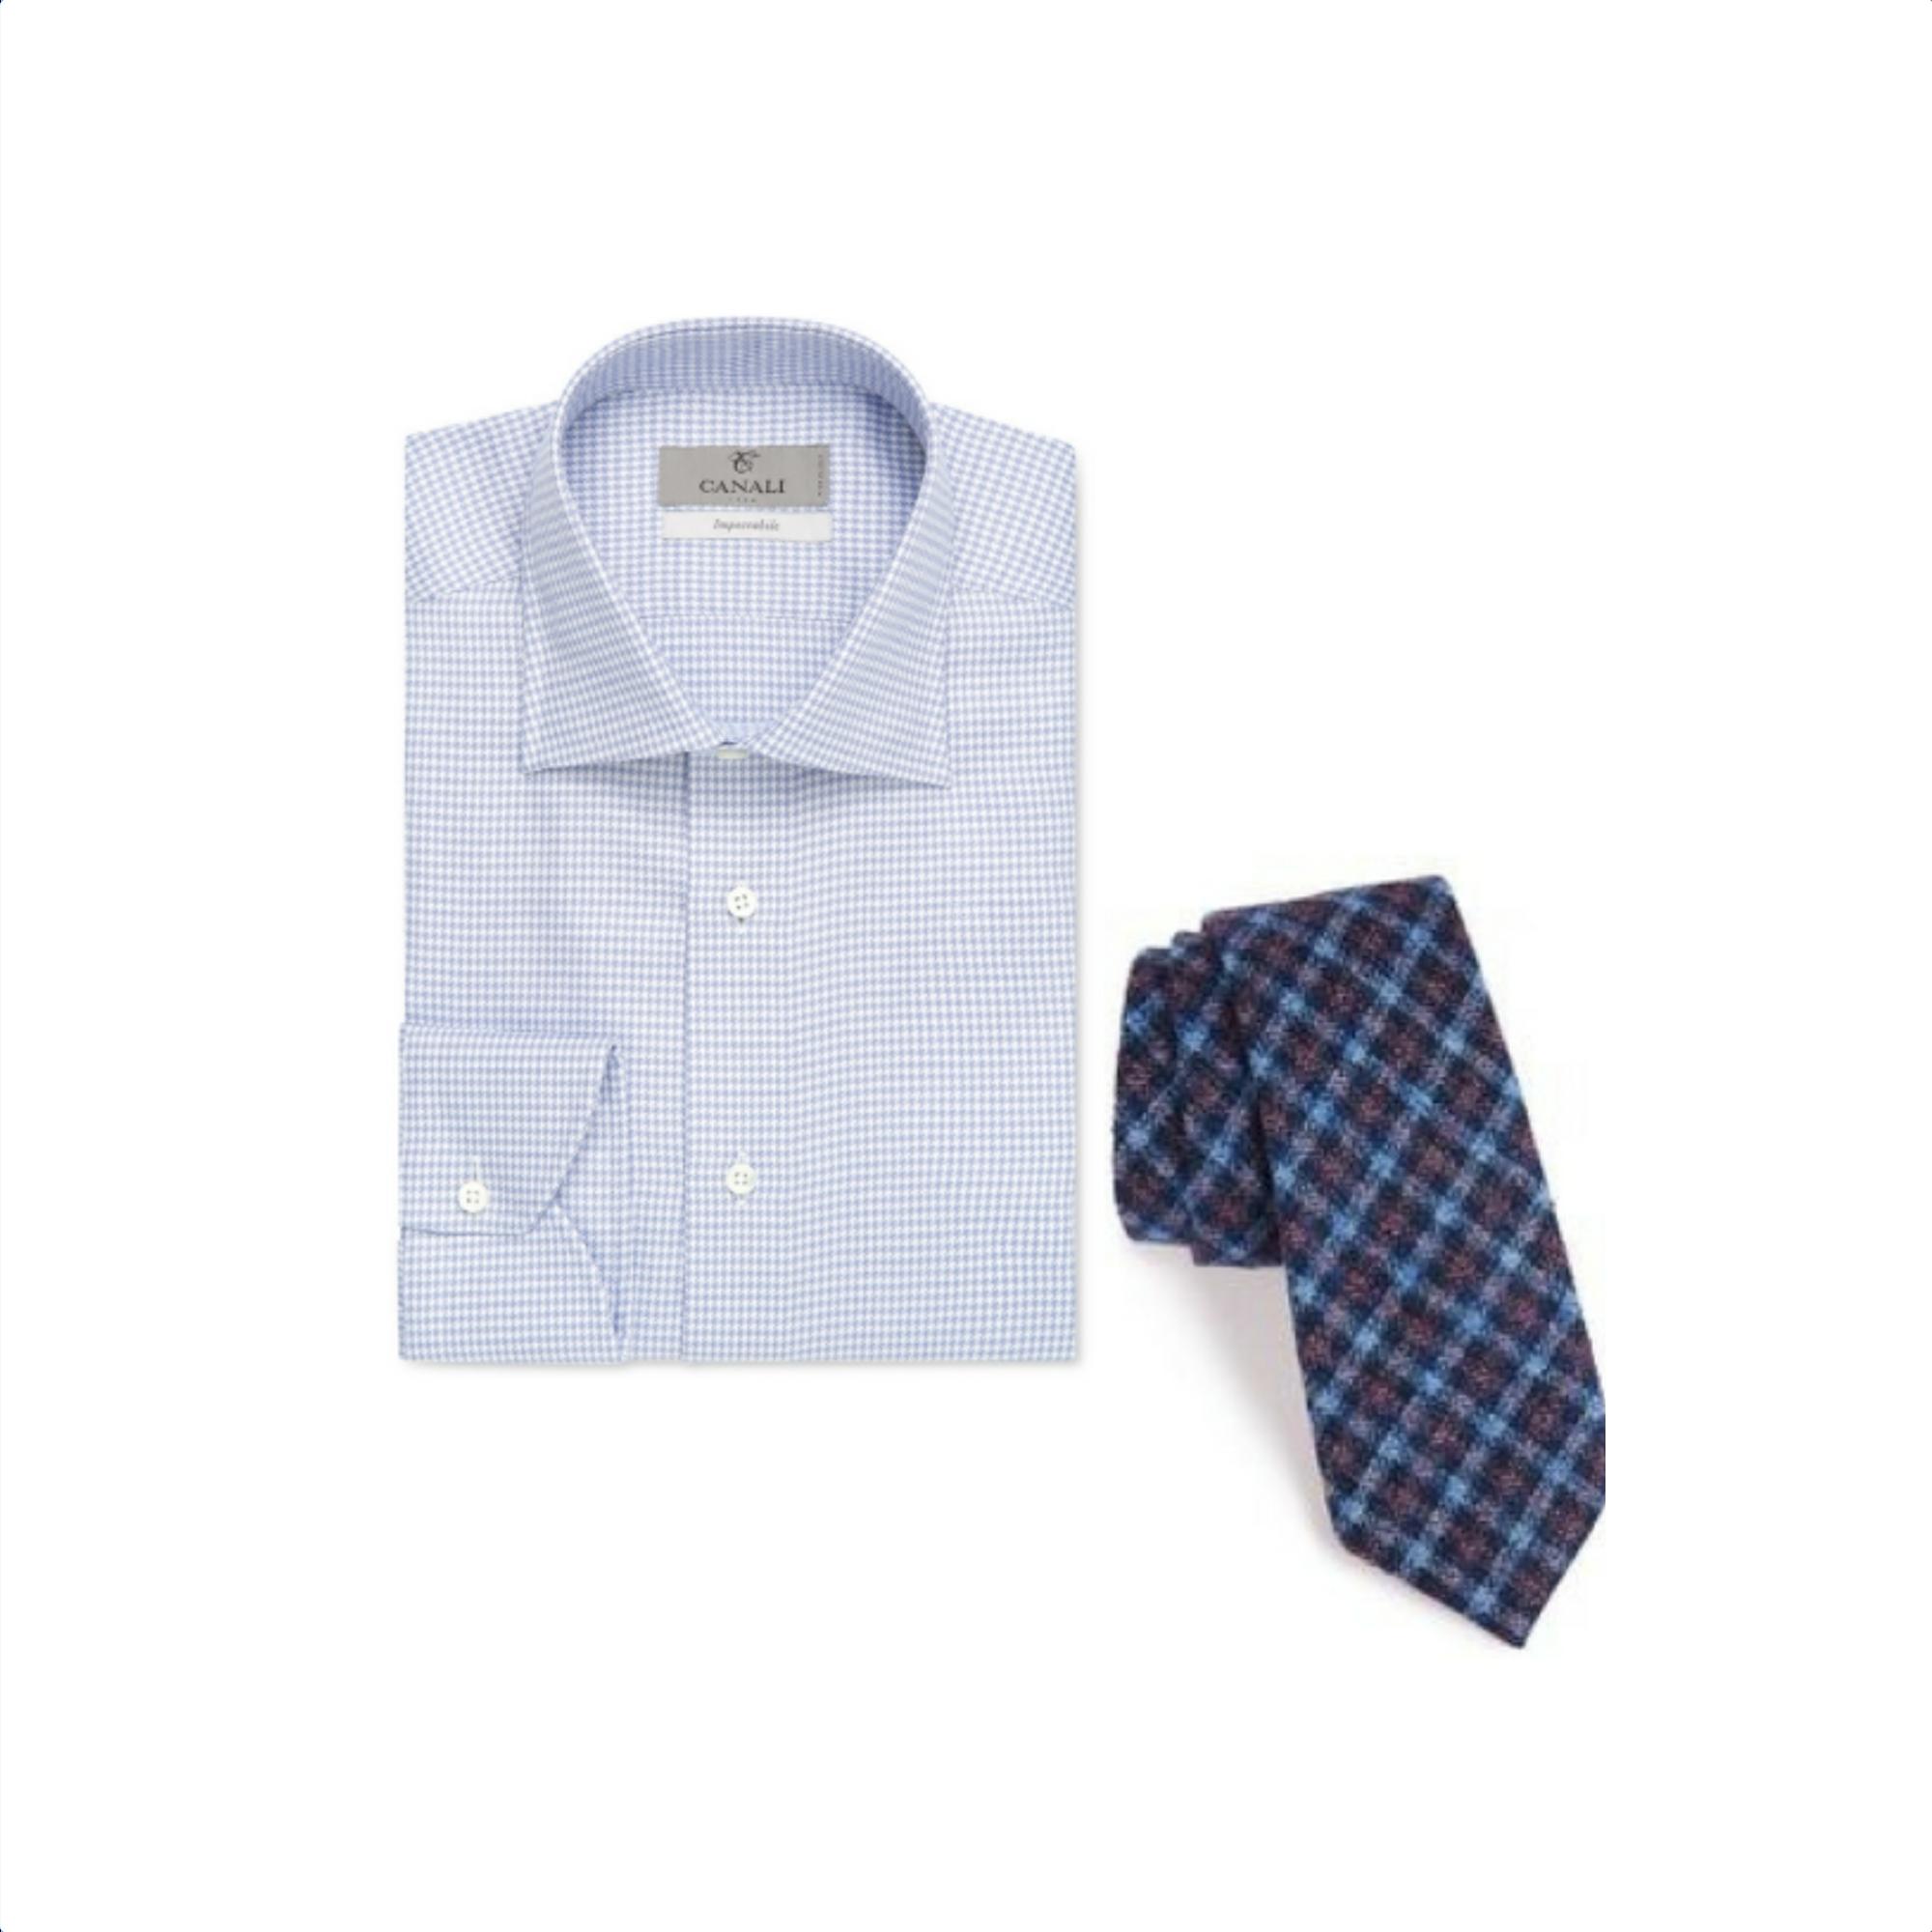 Canali Shirt Shirt & Alexander Olch Tie